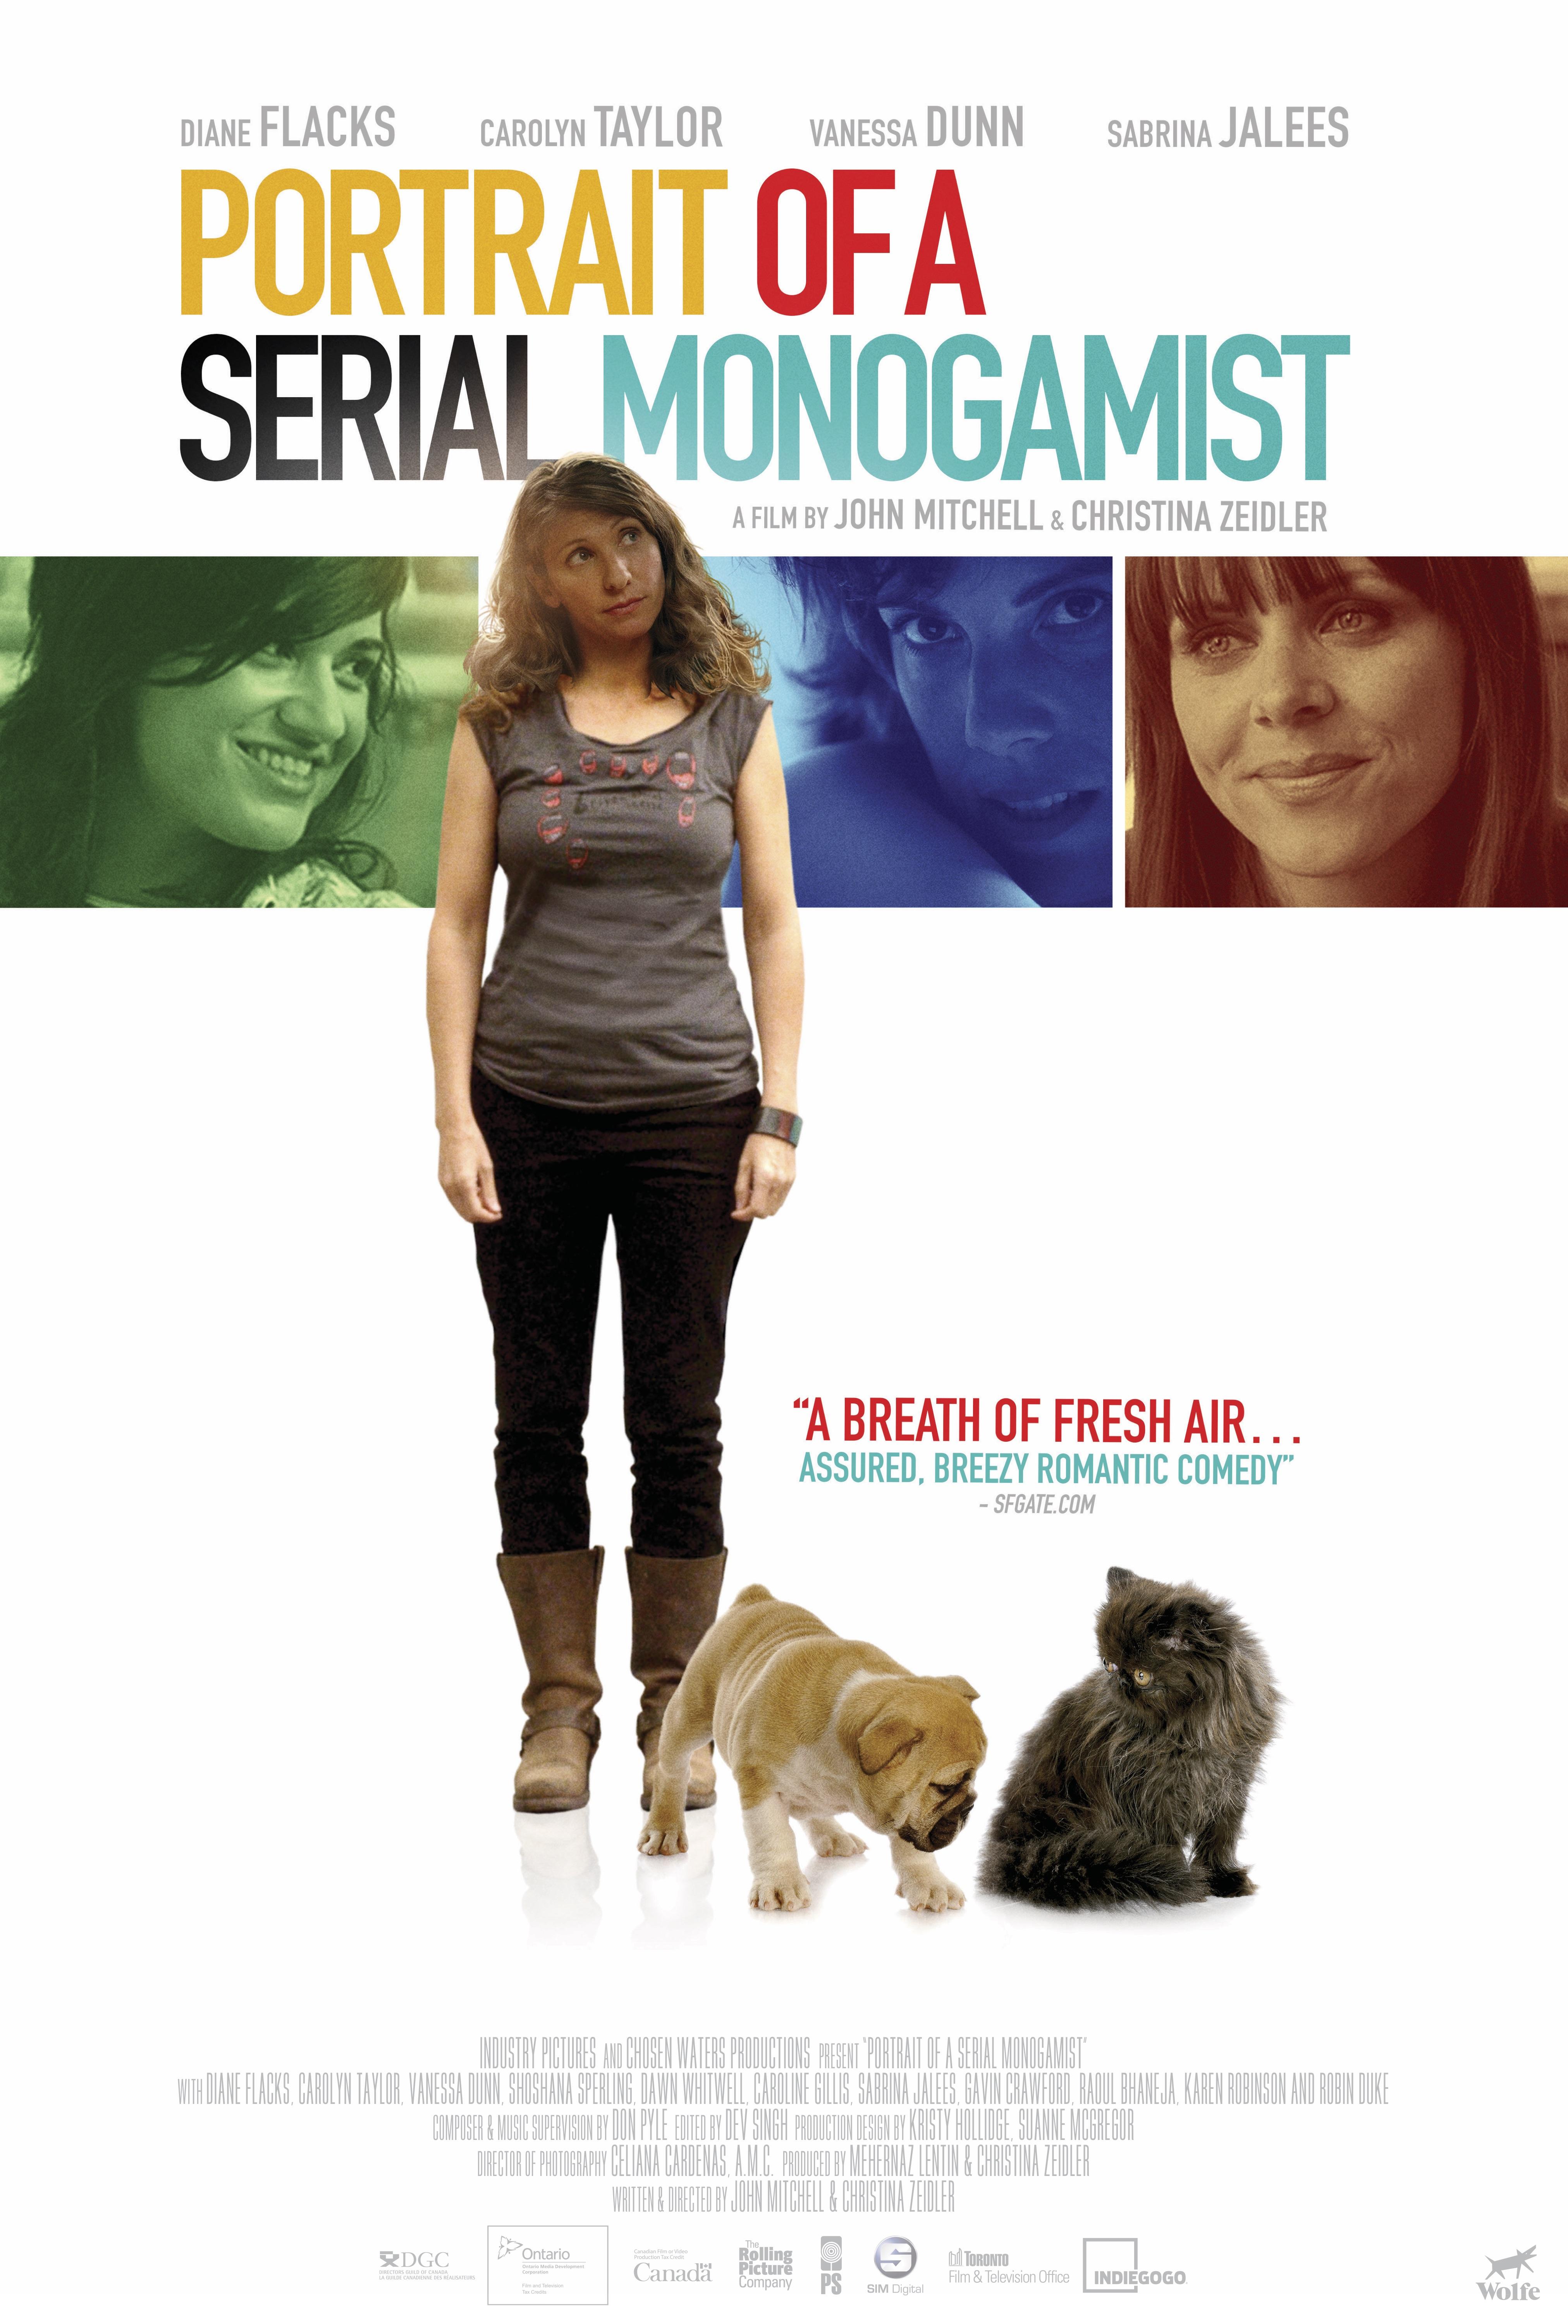 105. Portrait of a Serial Monogamist (2016)